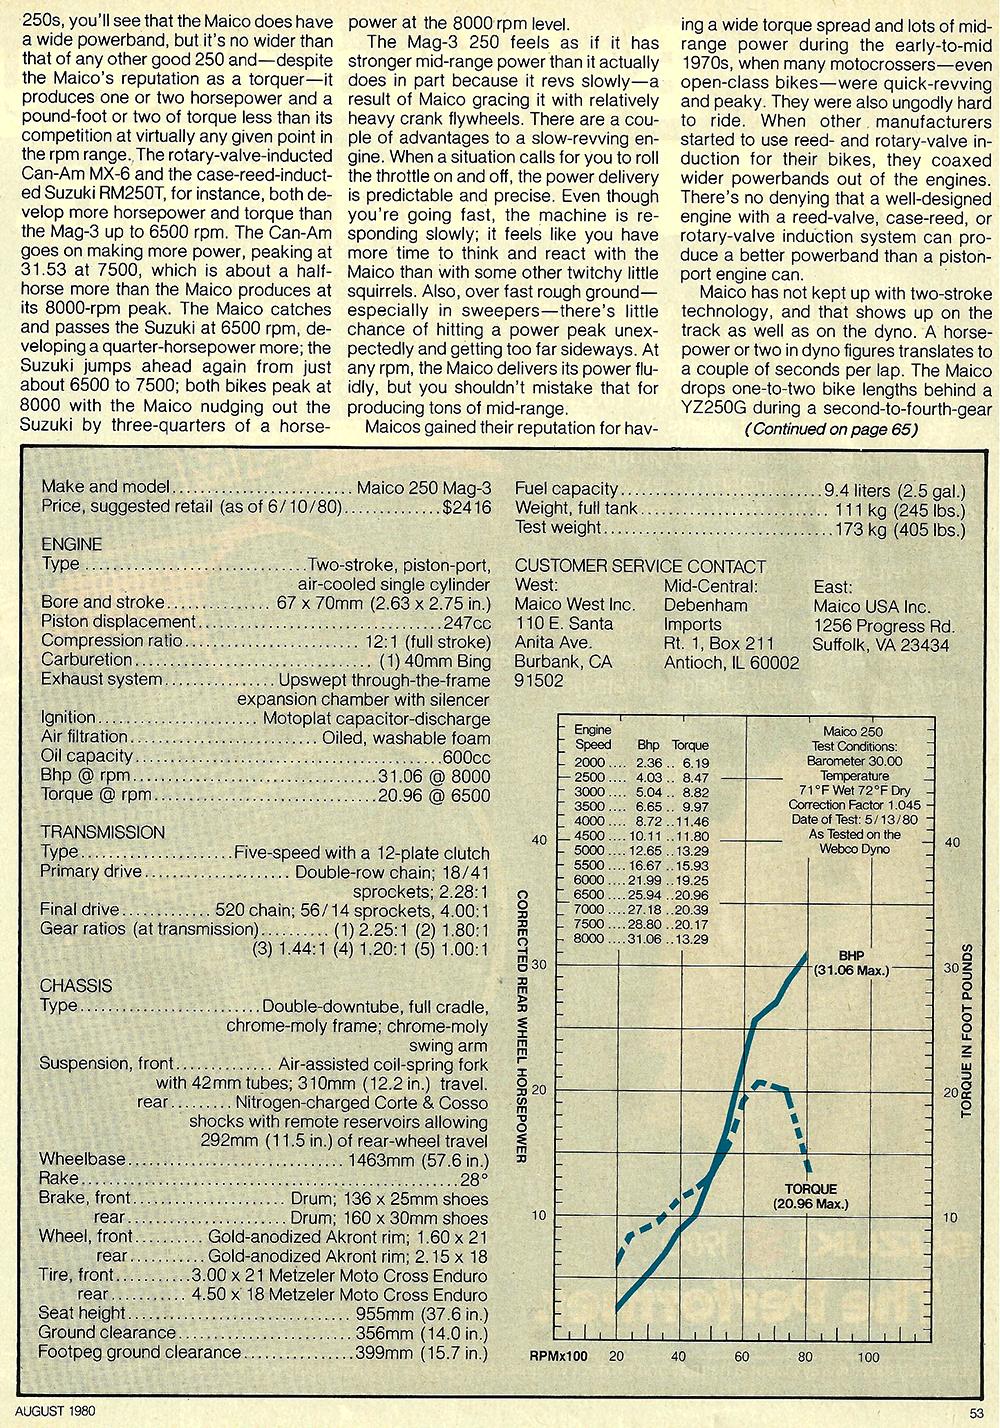 1980 Maico 250 Mag-3 road test 6.jpg